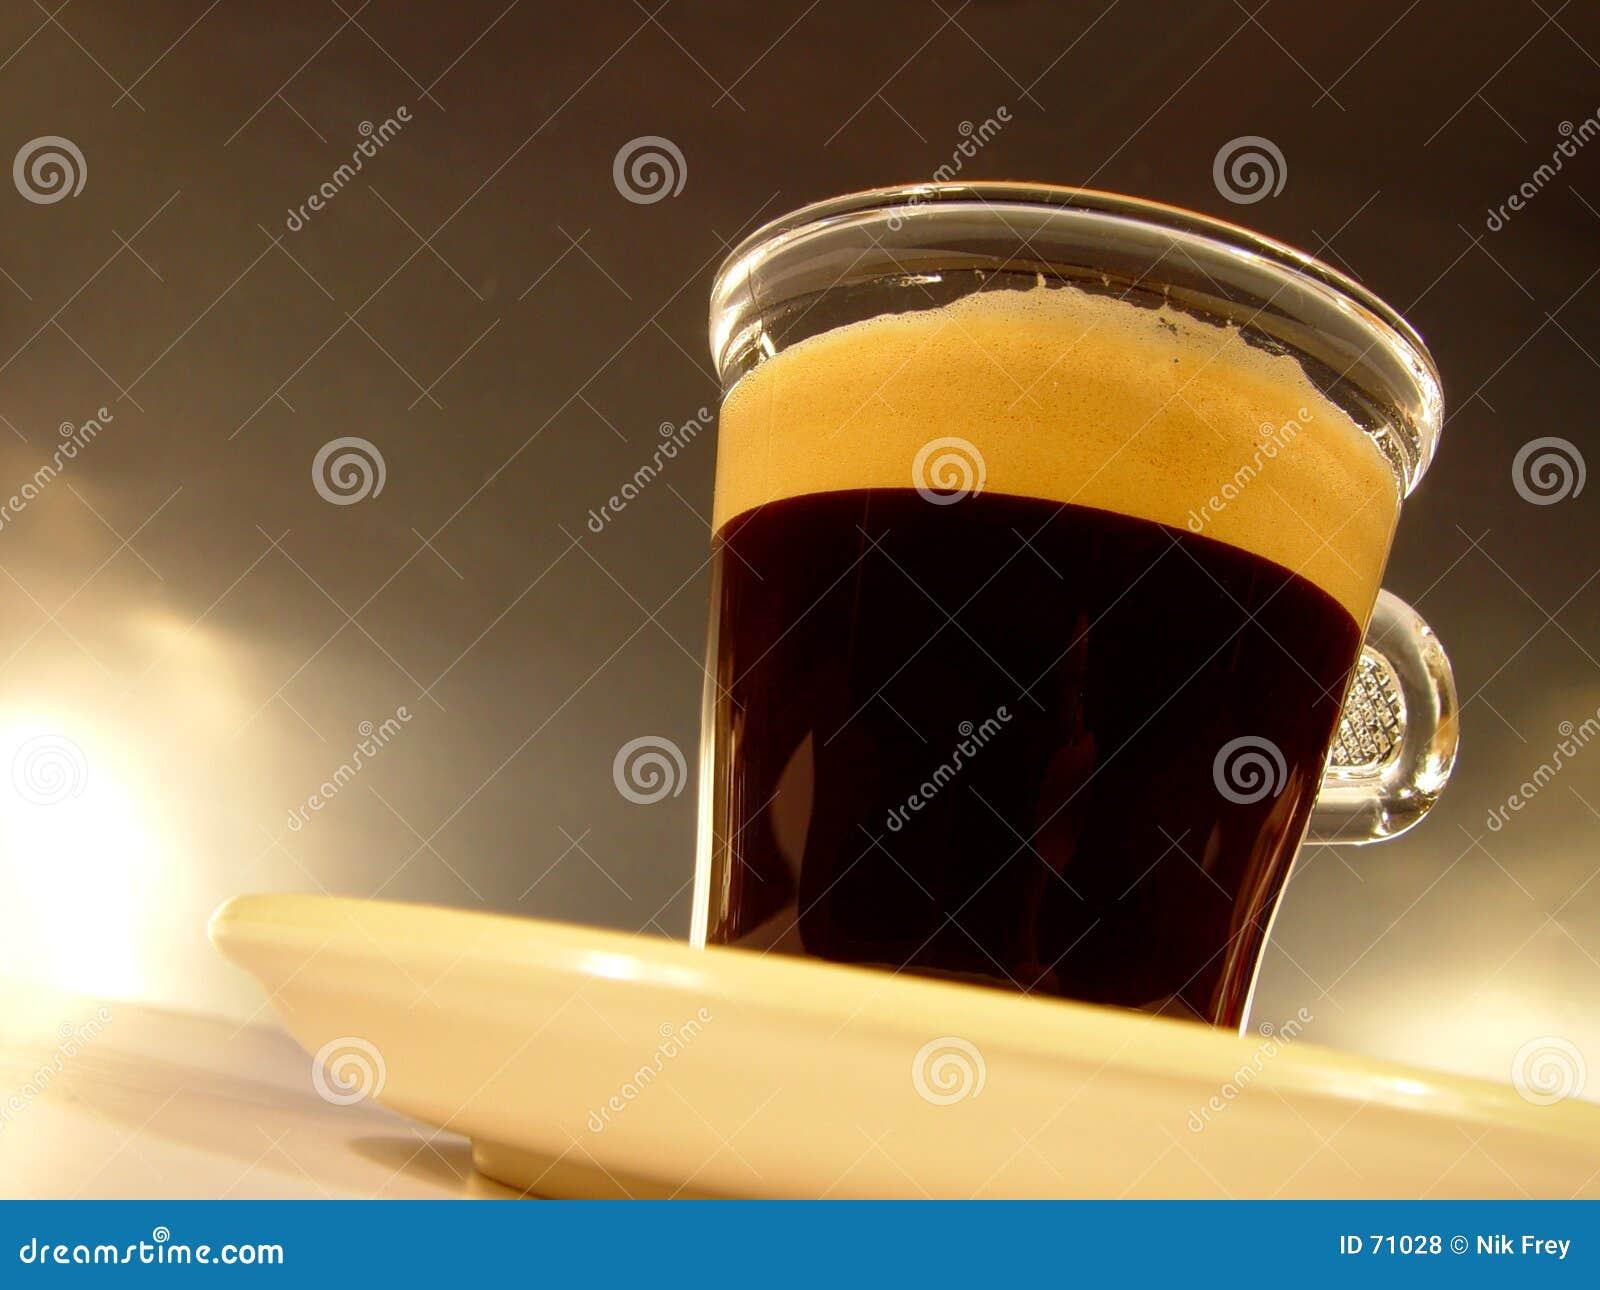 Glas of Coffee